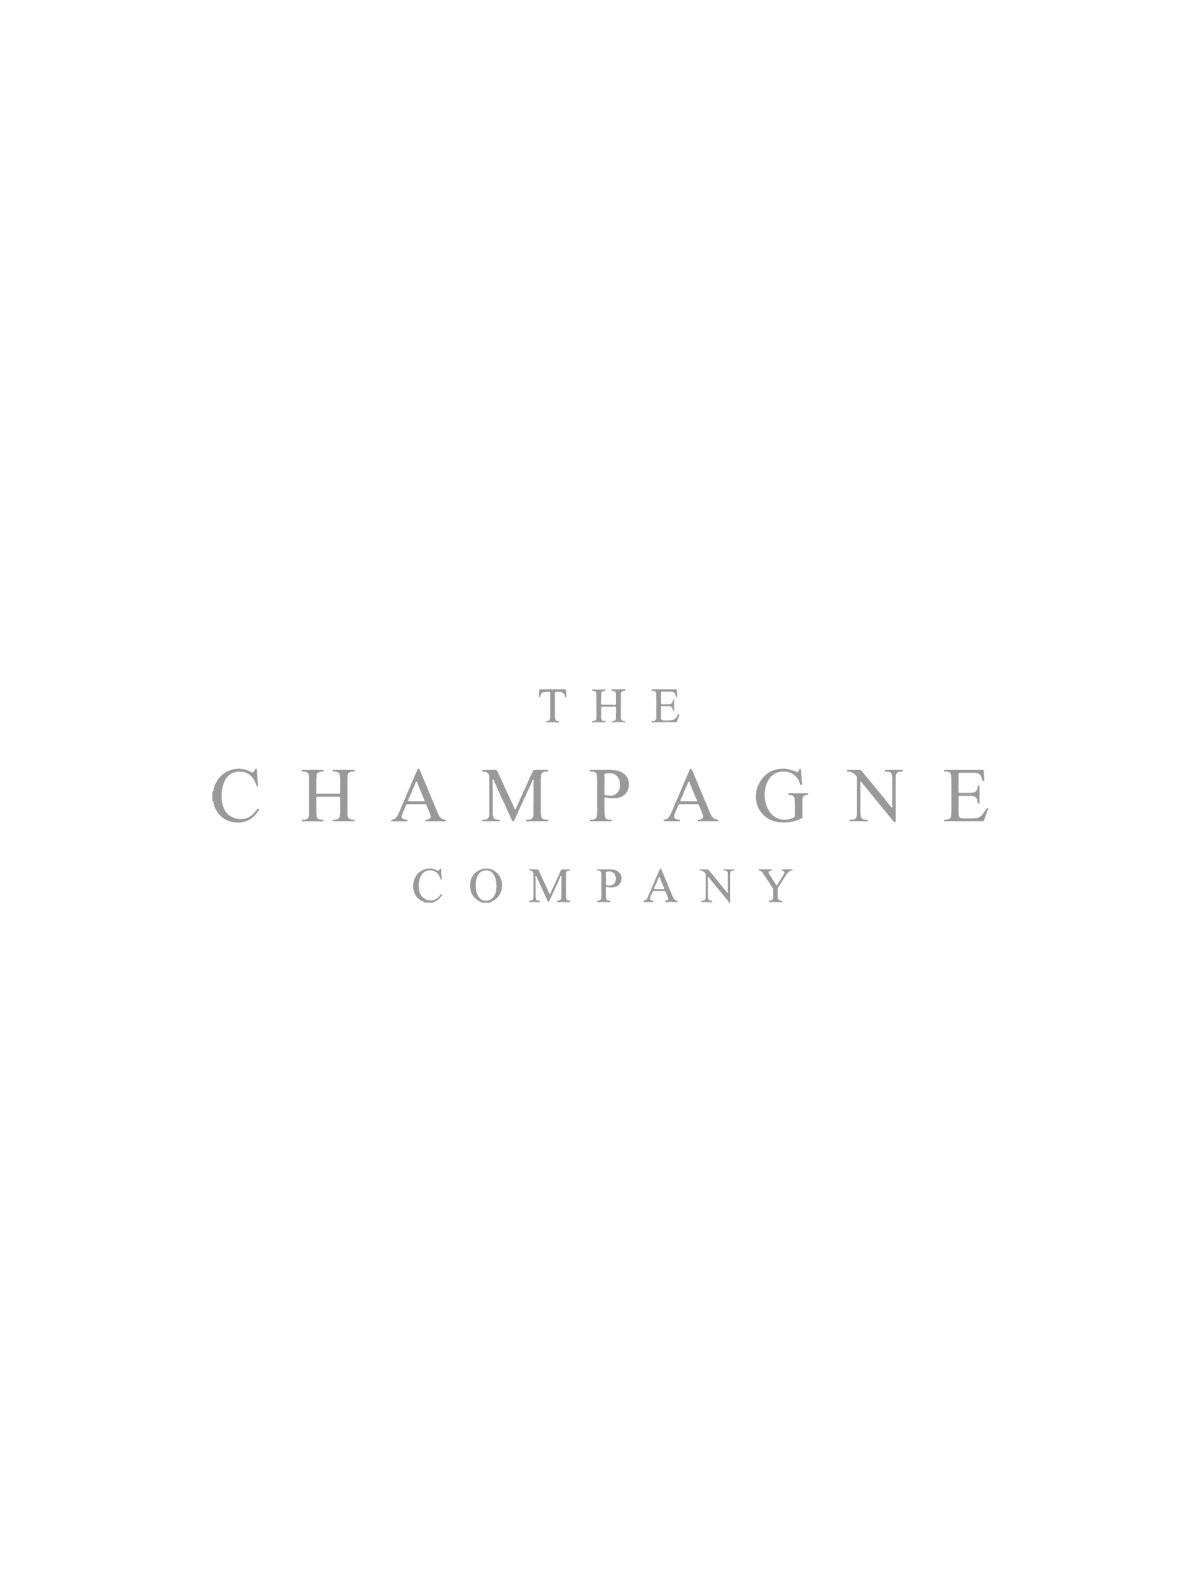 Nikka Whisky Co - Nikka Red Label 50cl